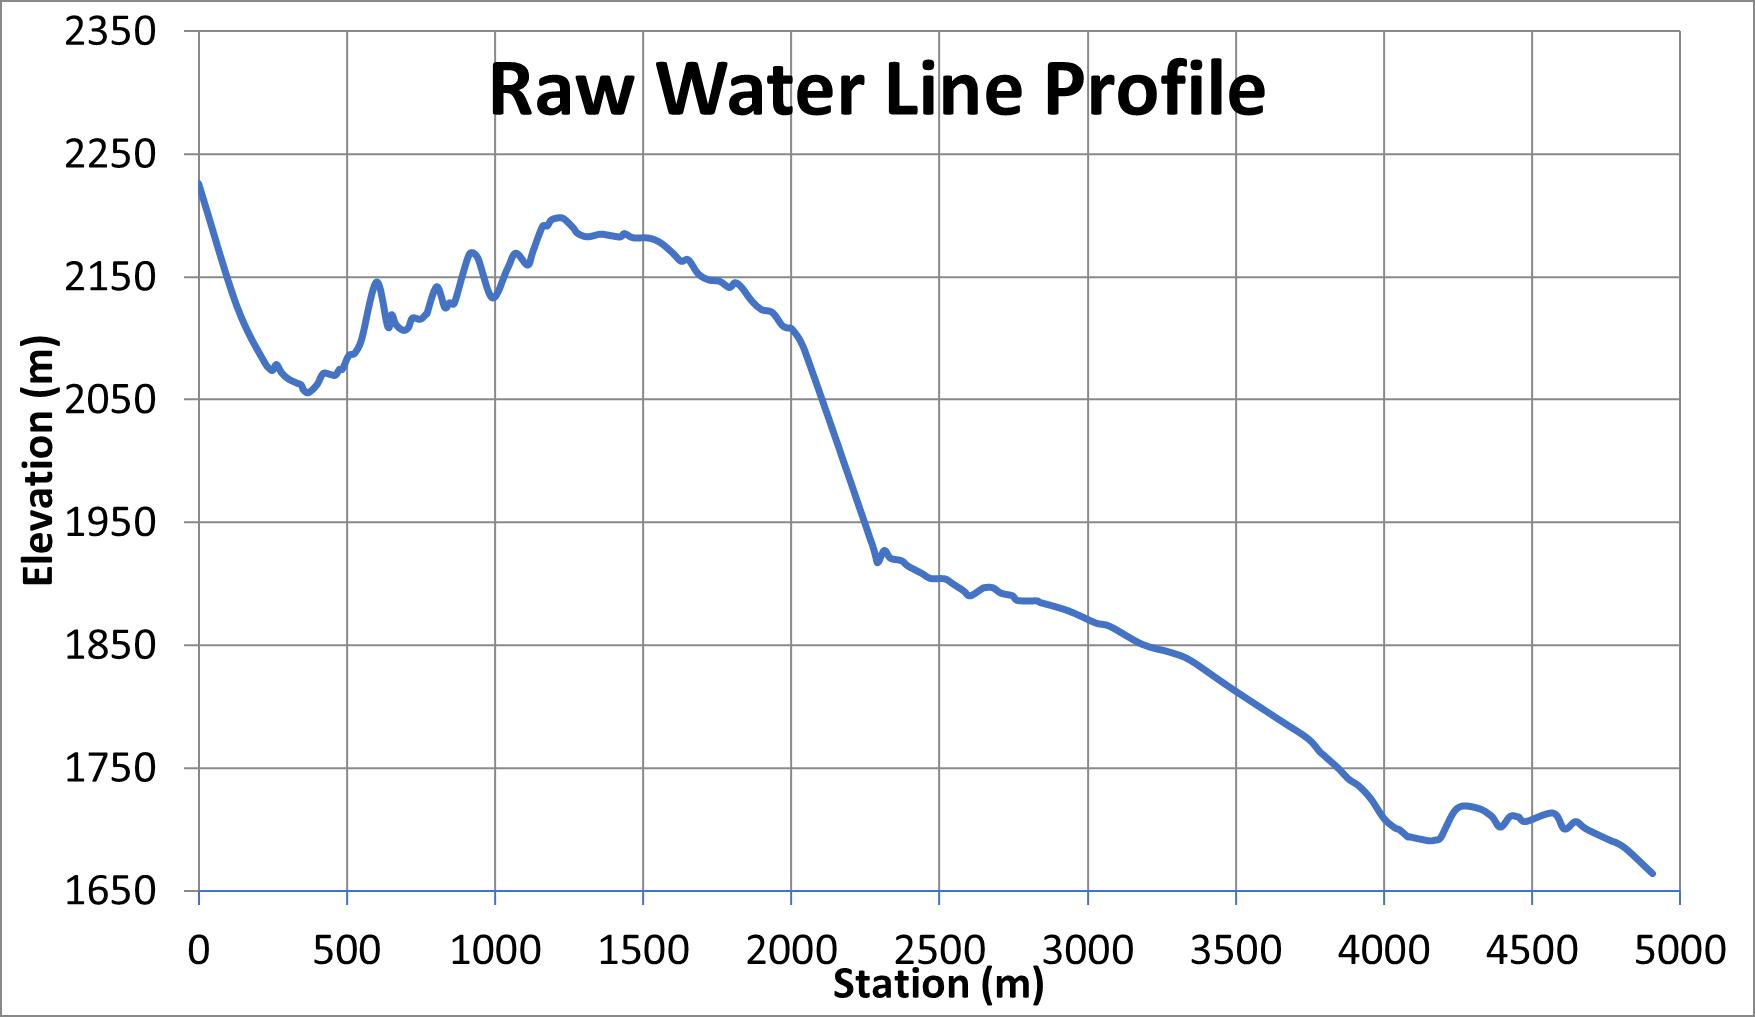 Image 10 Raw Water Line Profile